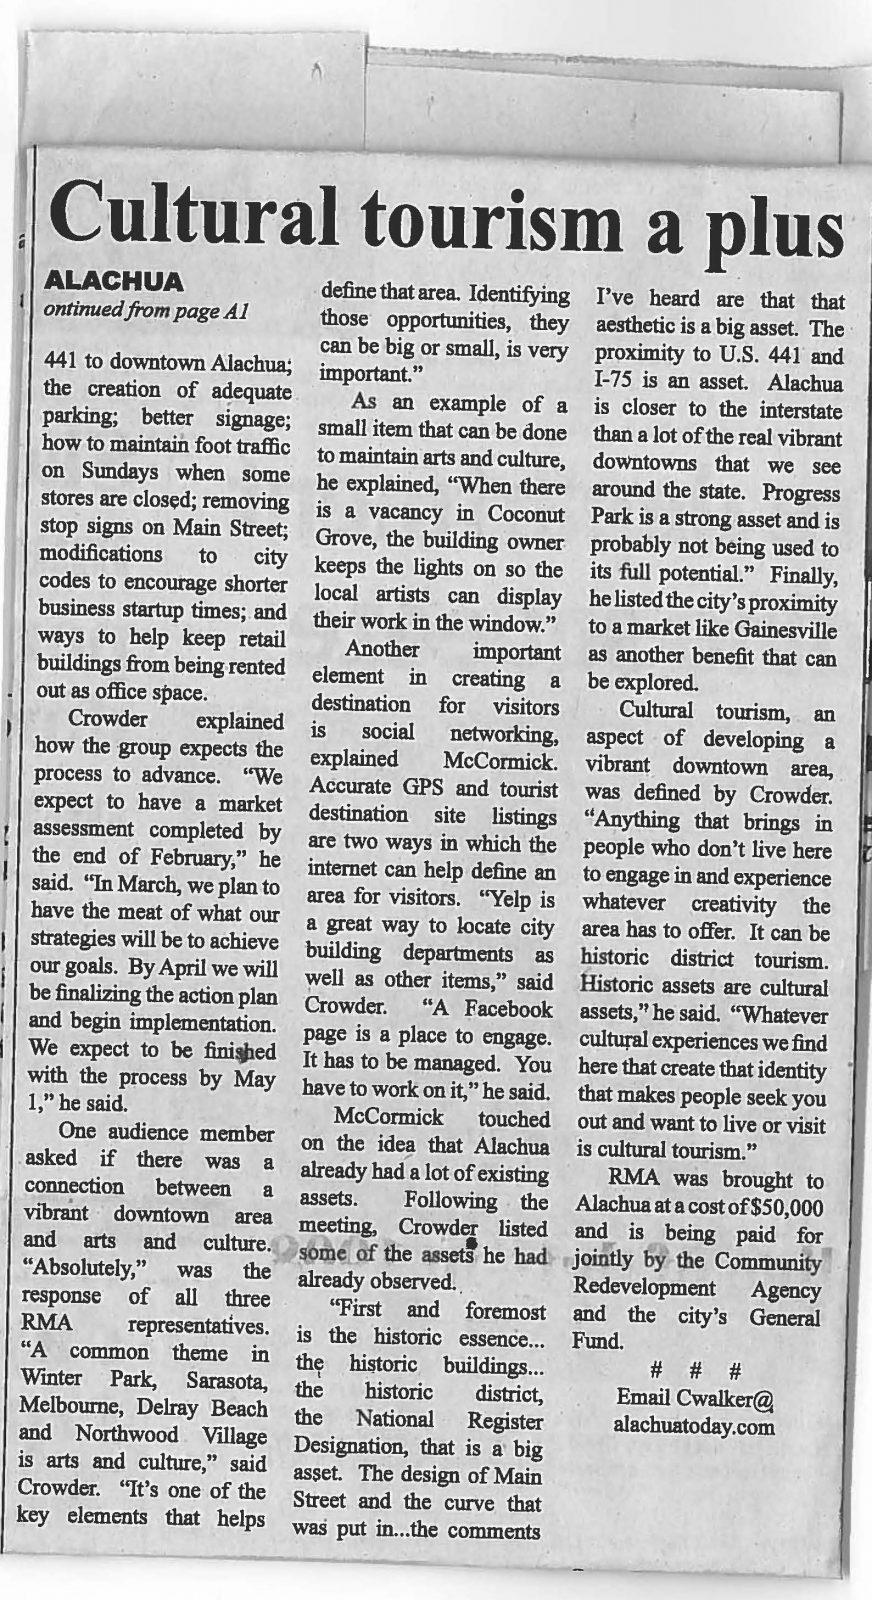 Alachua Today News 1.28 page 2